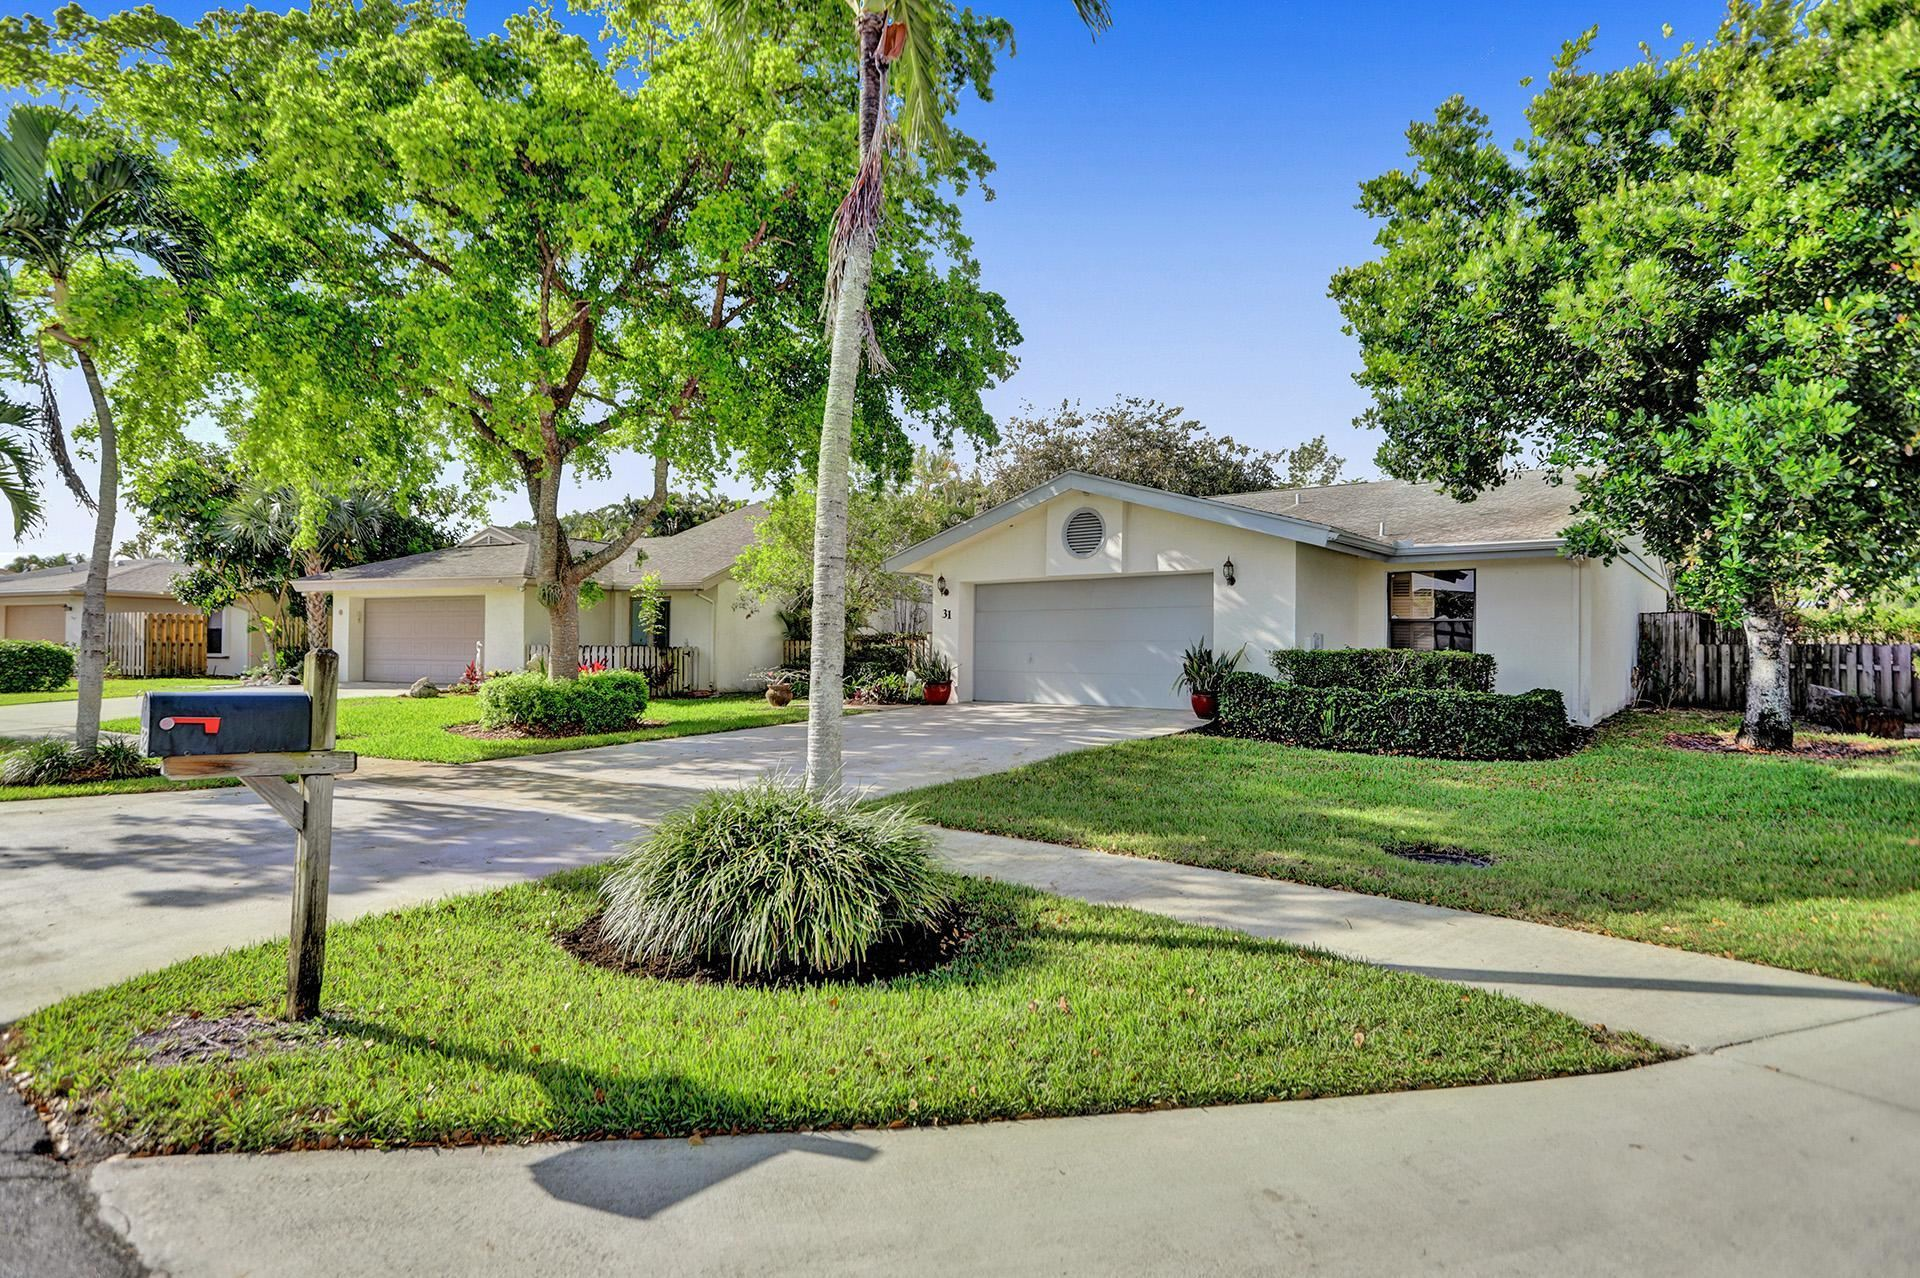 Photo of 31 Baytree Circle, Boynton Beach, FL 33436 (MLS # RX-10715258)